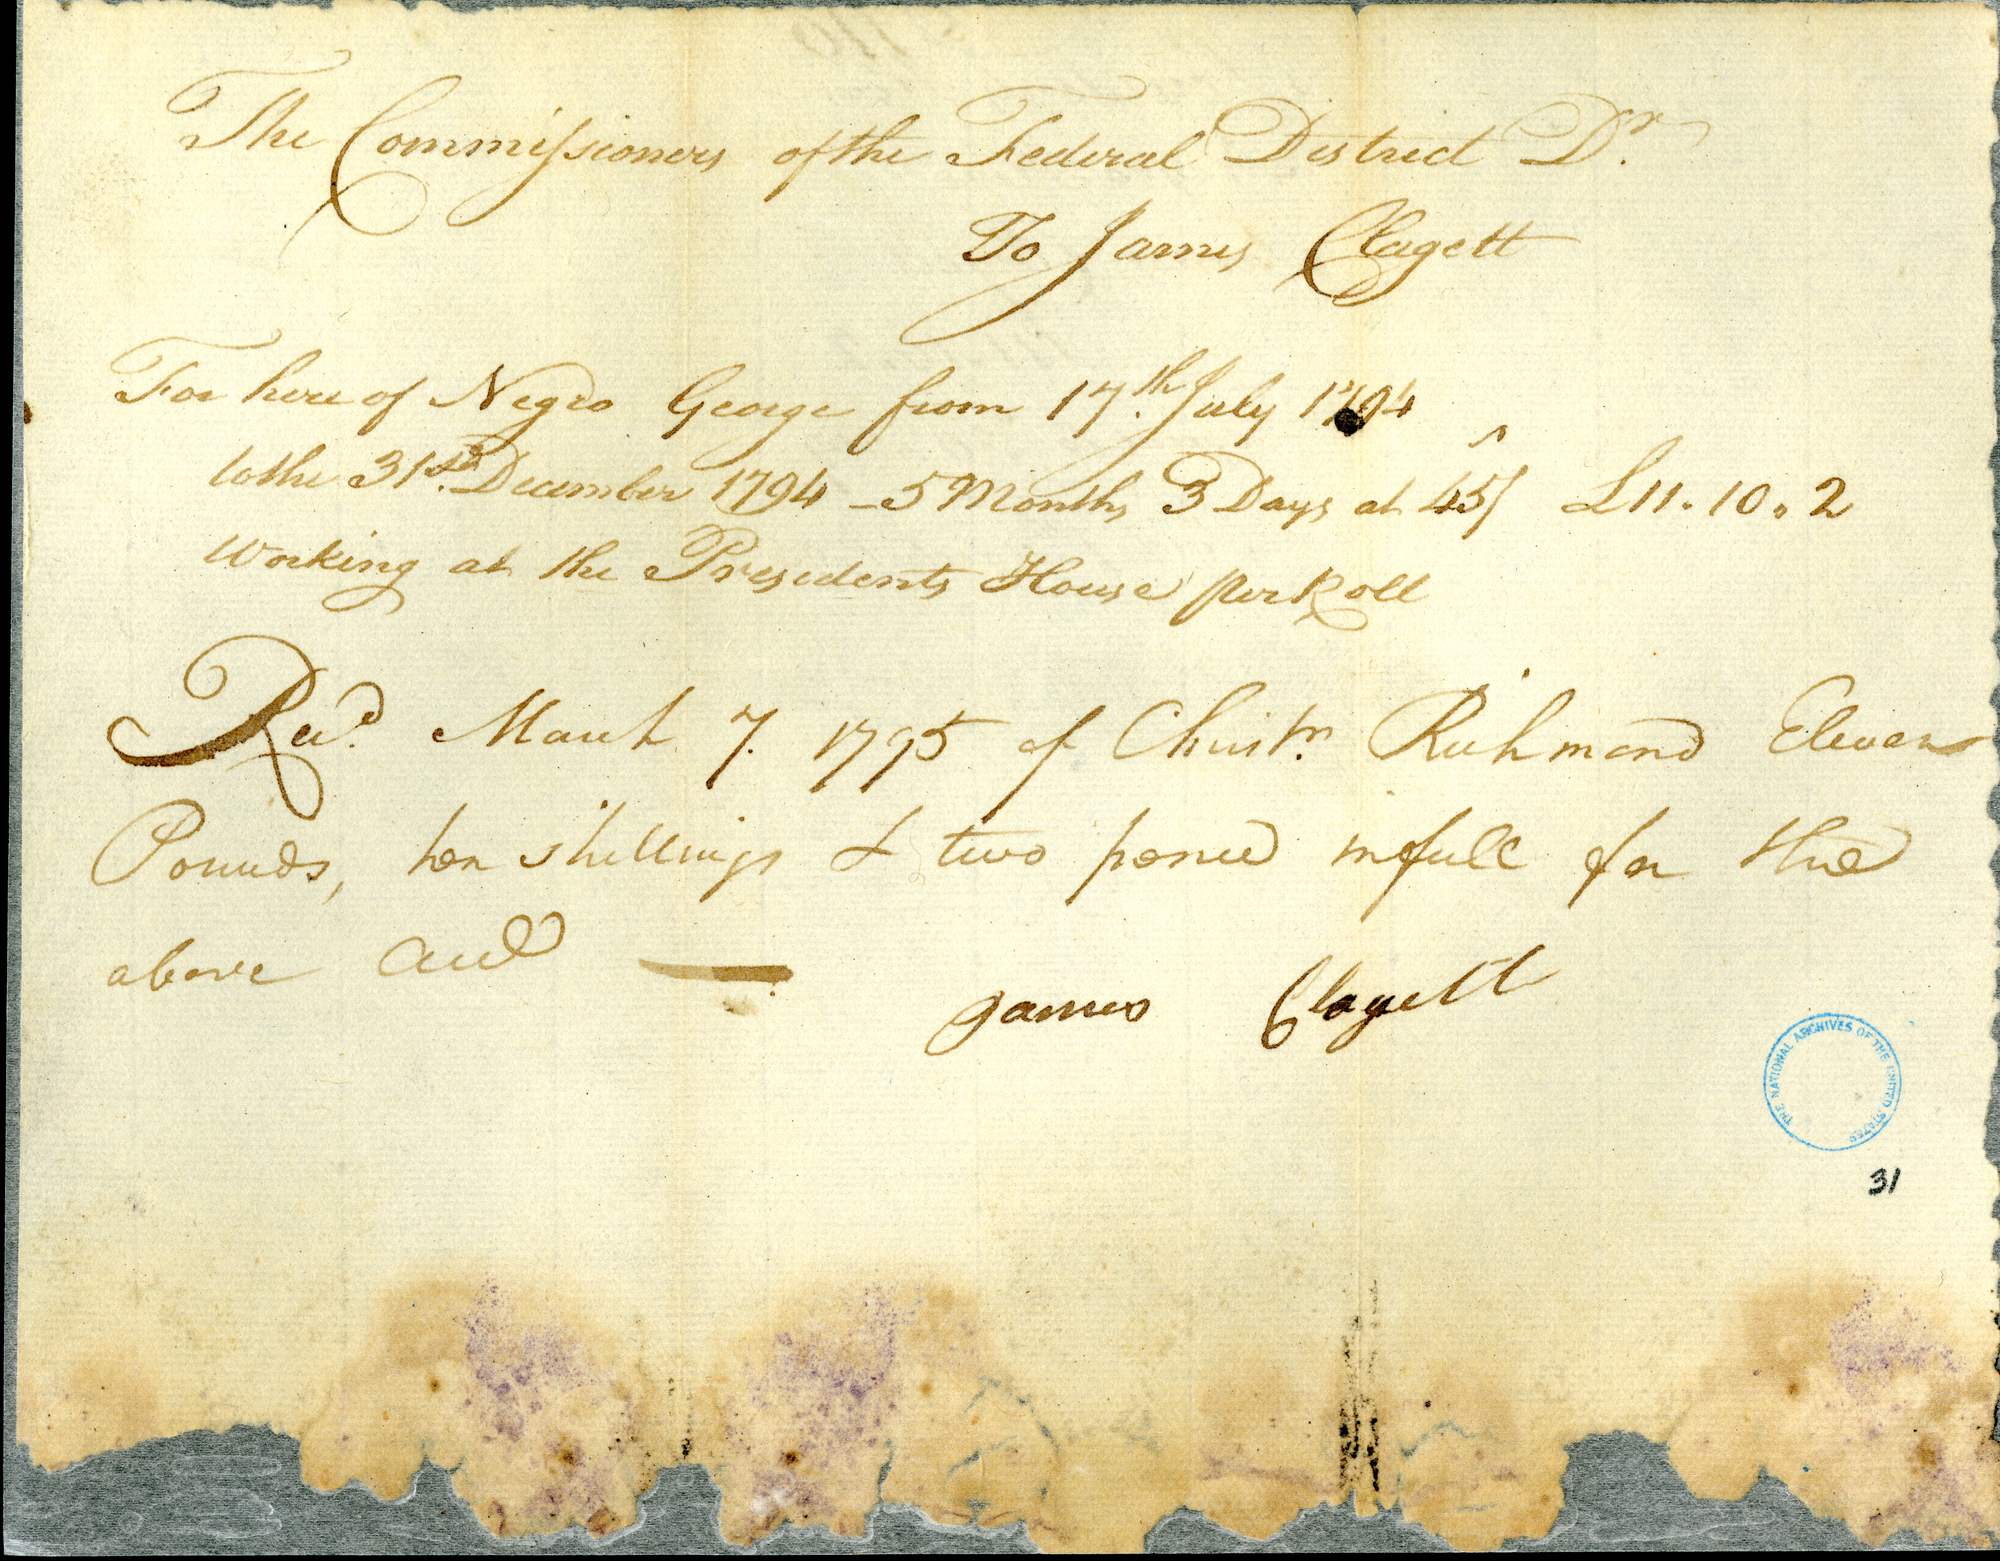 clagett-payment-voucher-1795